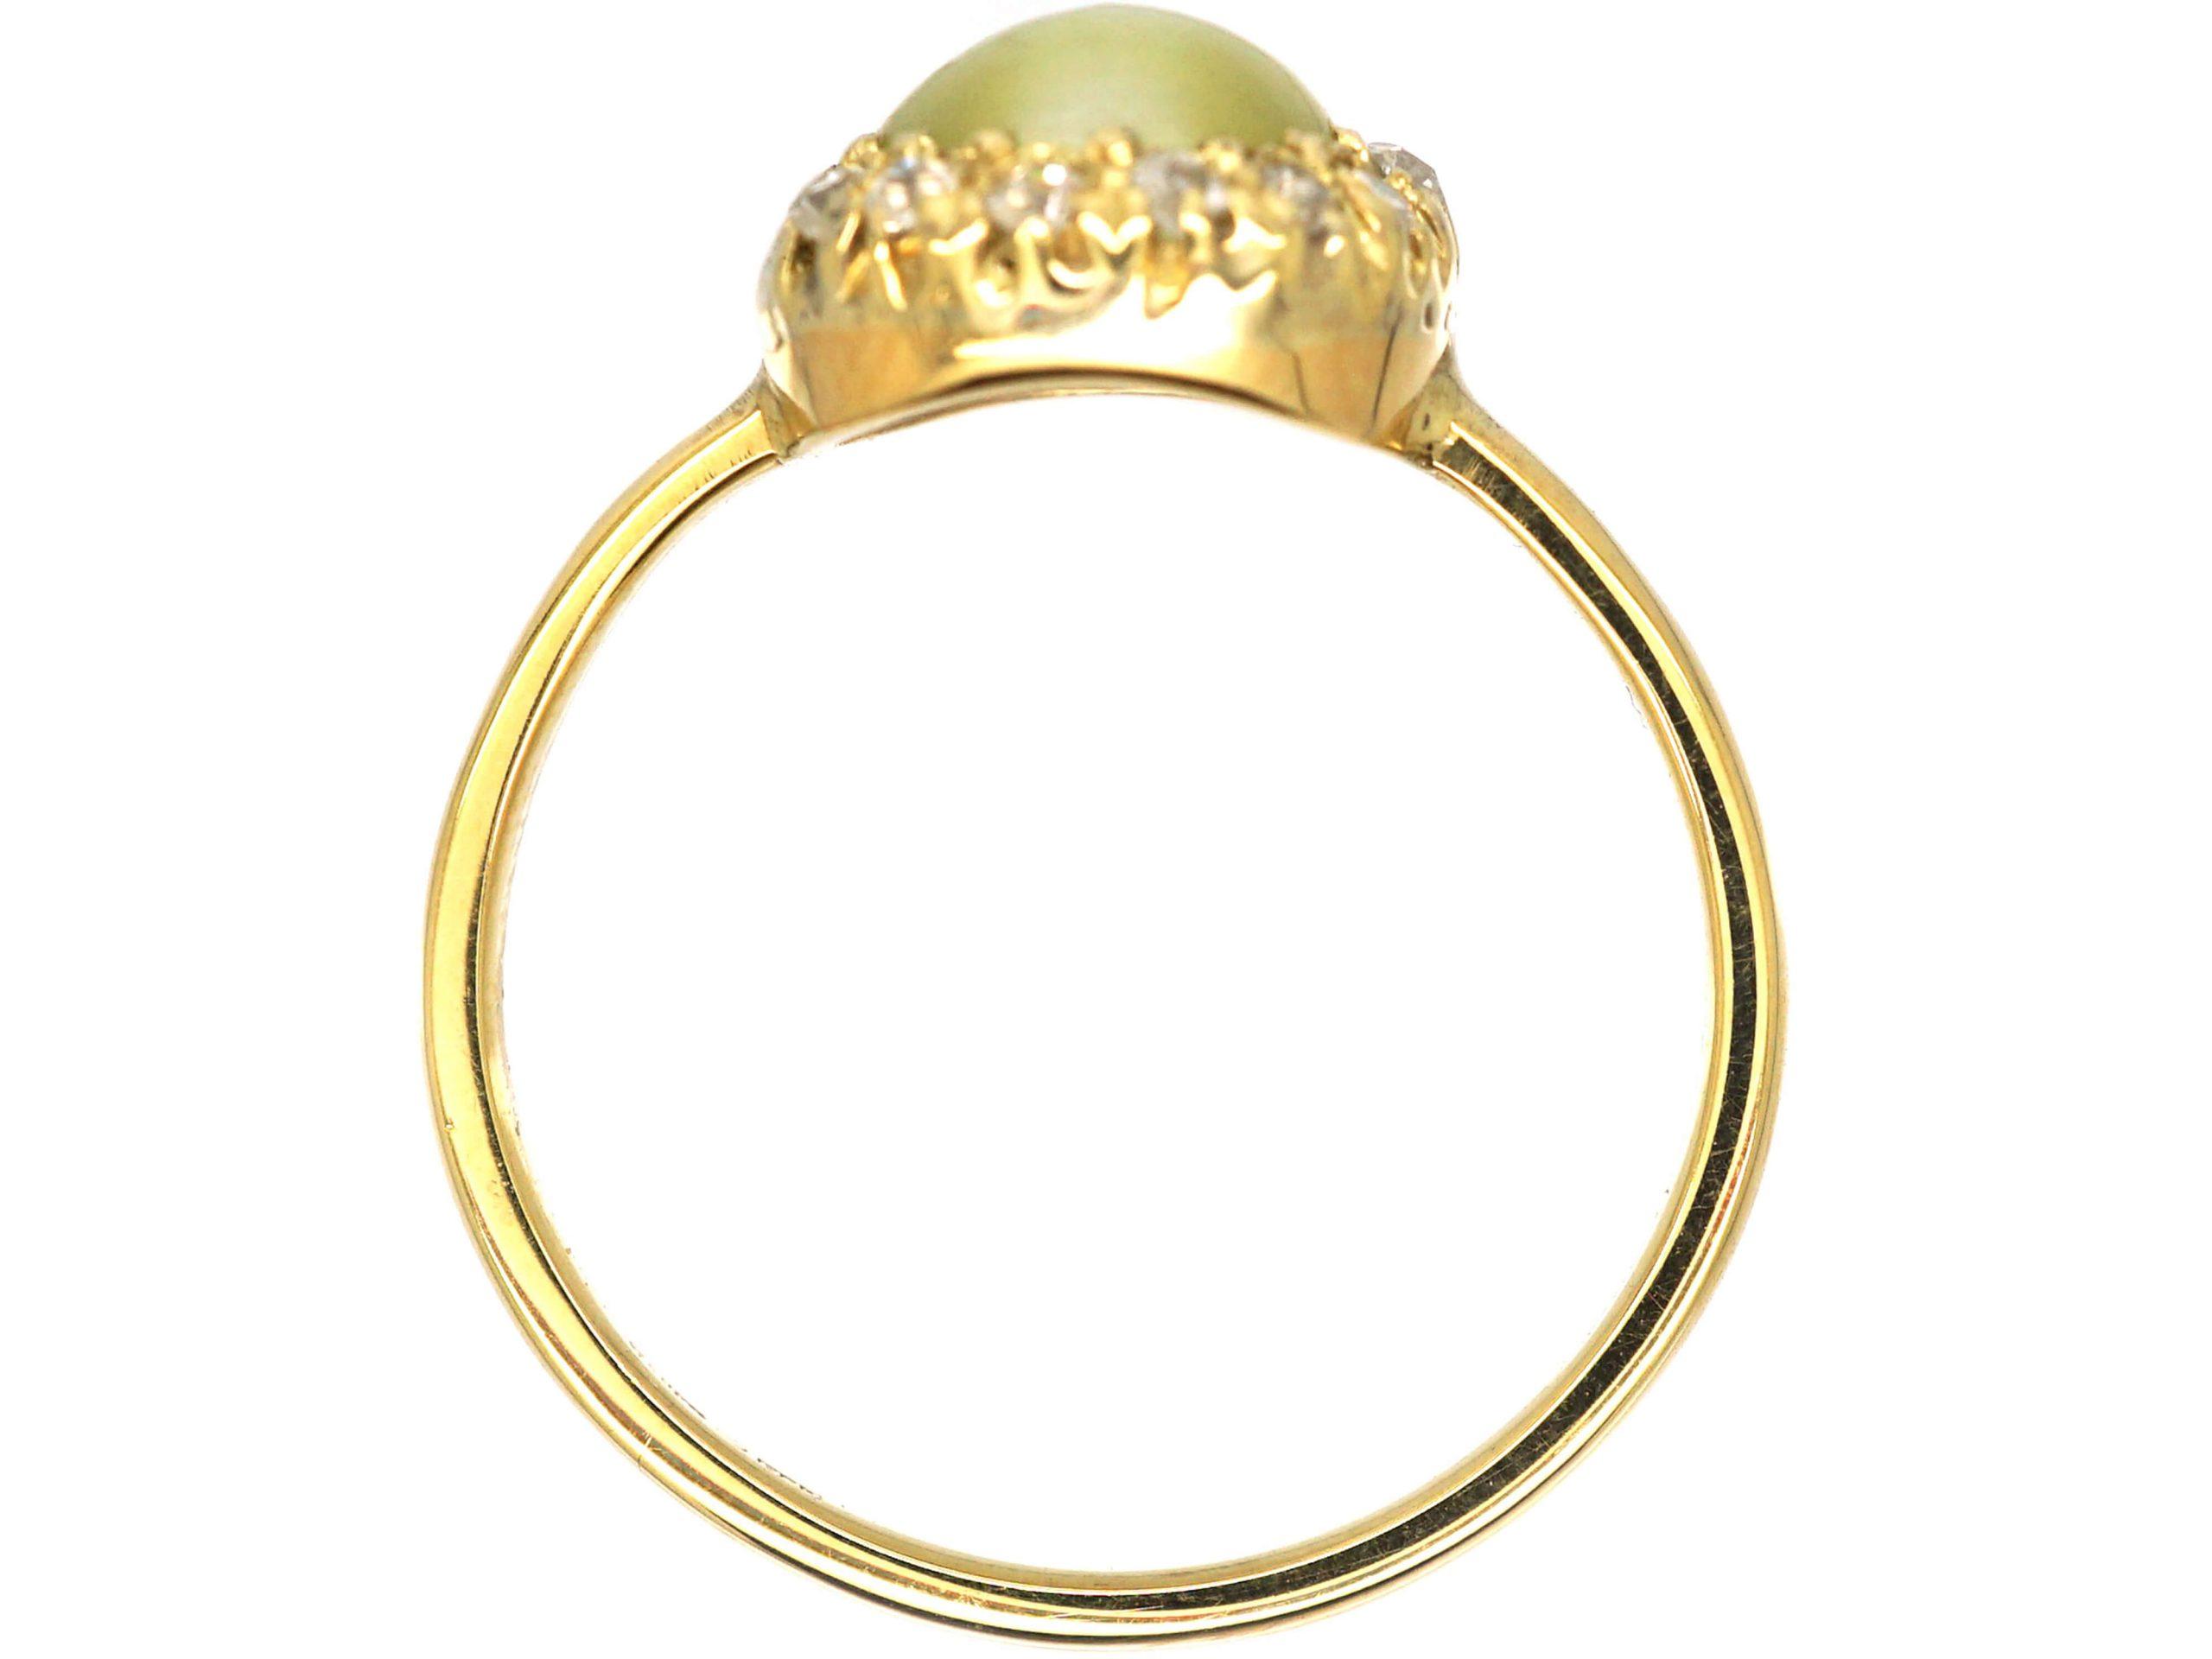 Edwardian 18ct Gold Cats-Eye Chrysoberyl & Diamond Cluster Ring